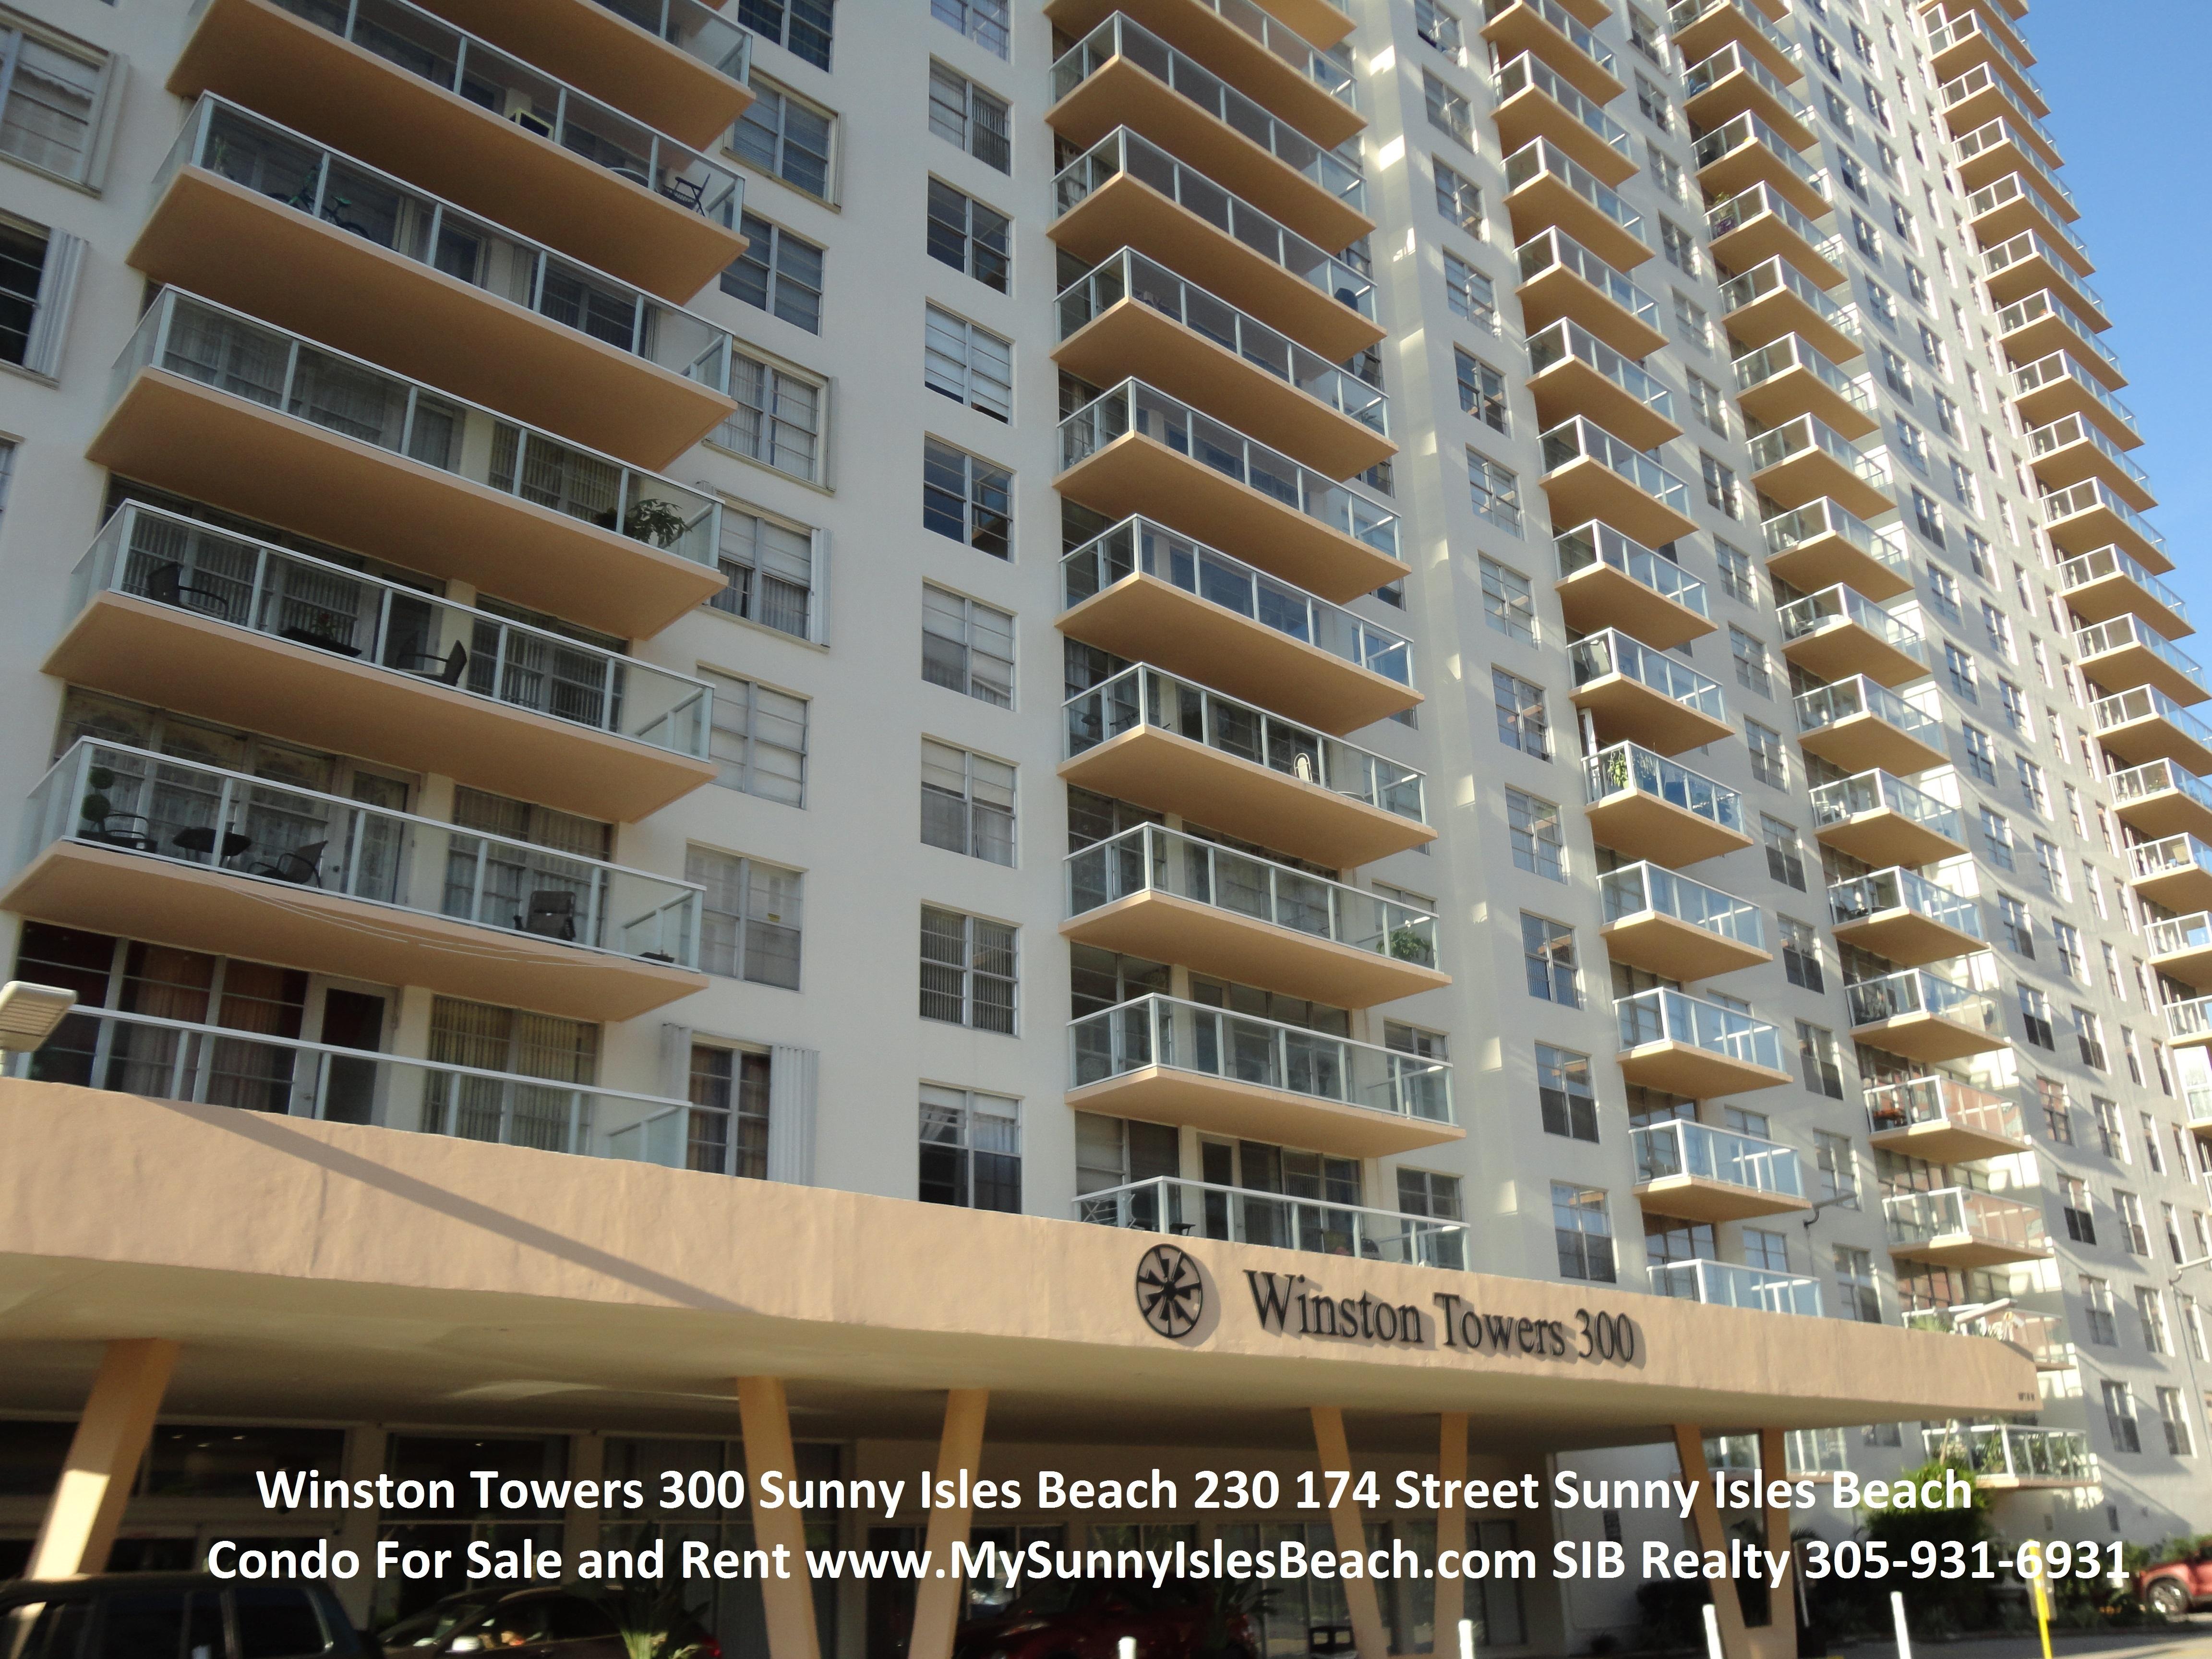 Winston Towers 300 Sunny Isles Beach